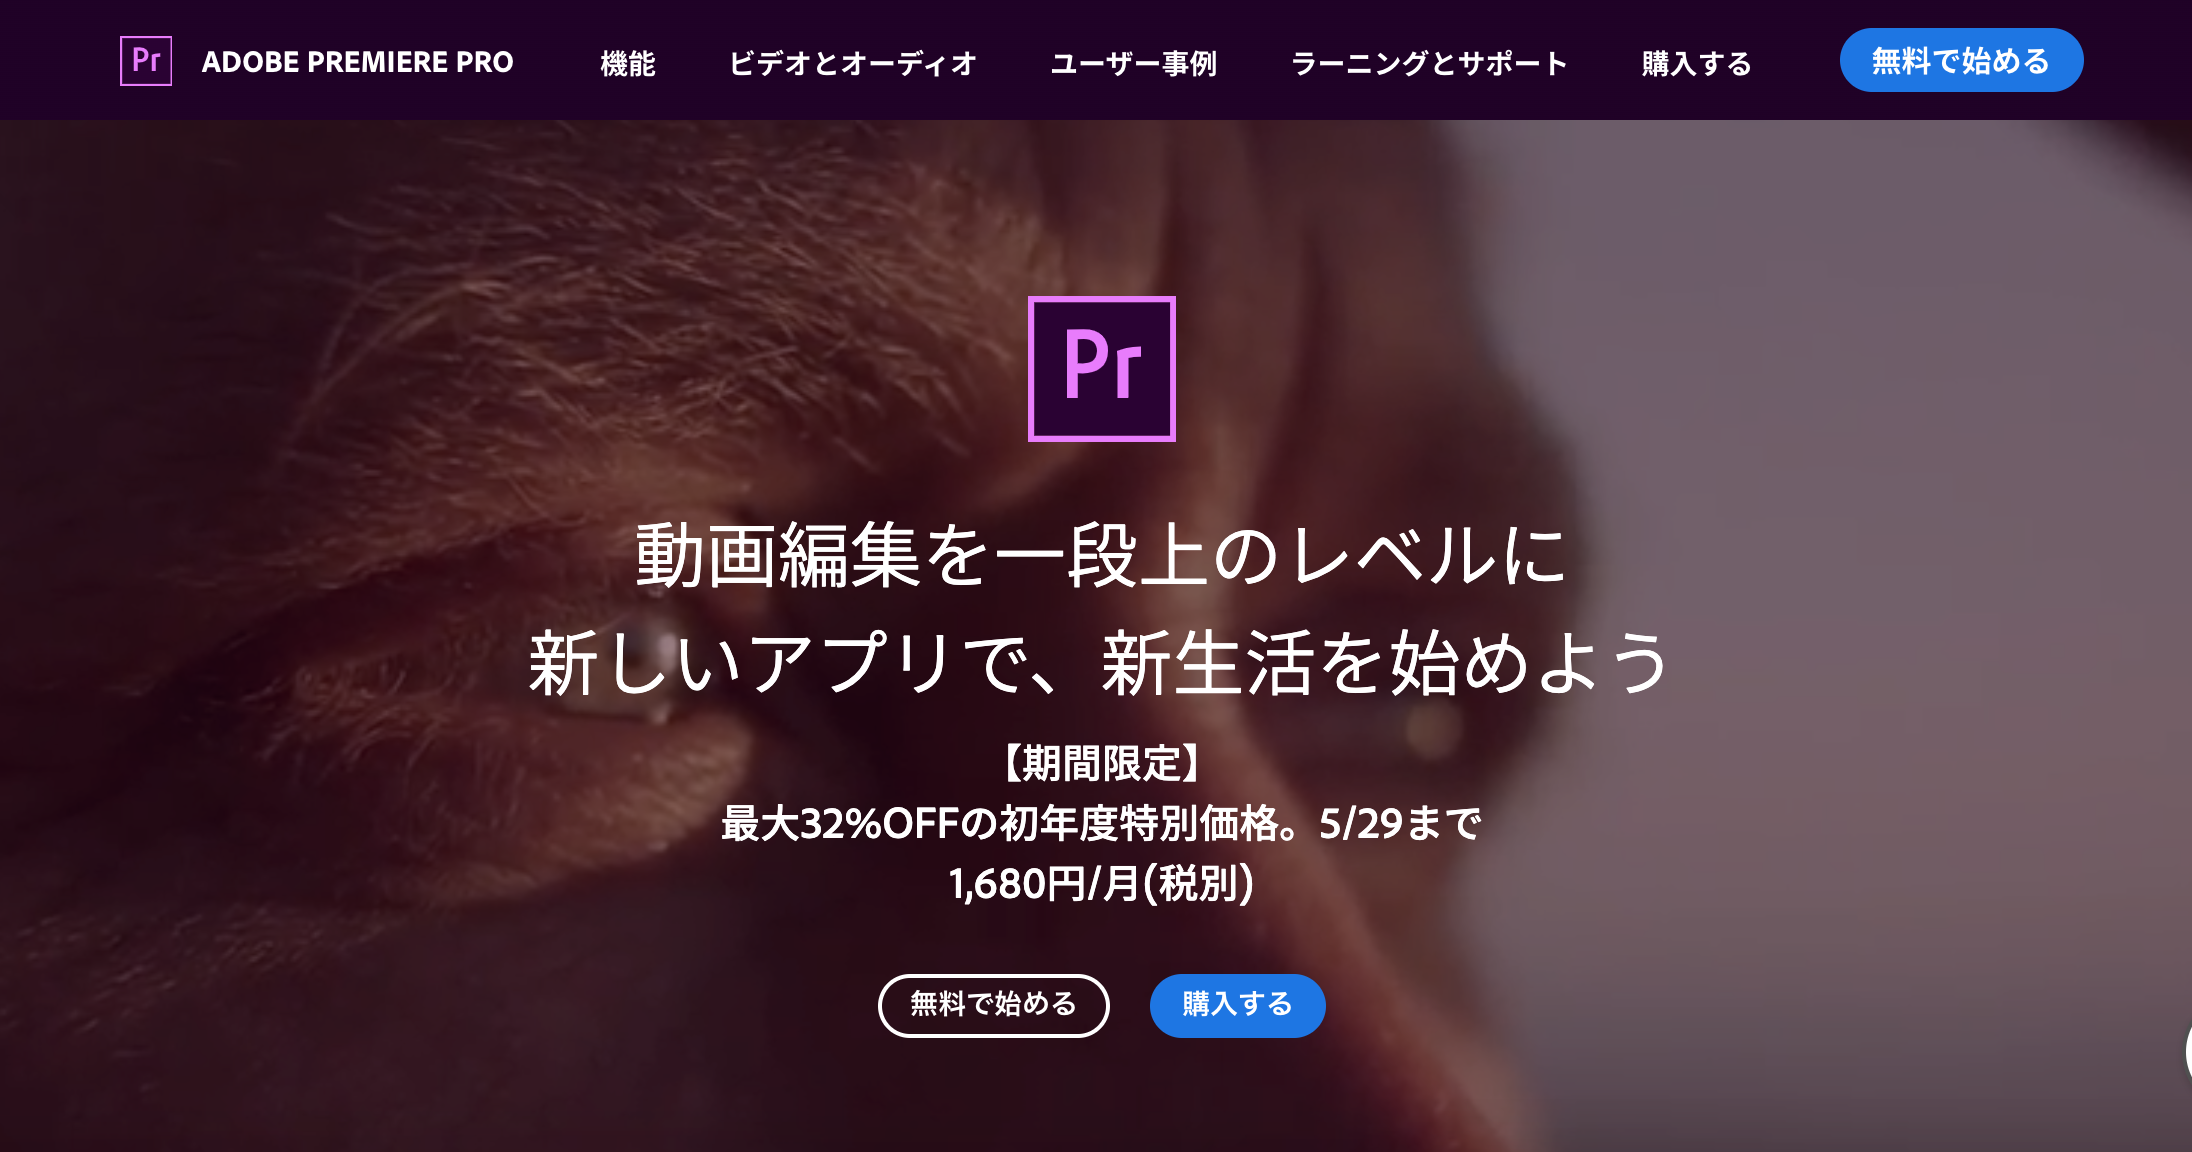 【PC】YouTuberにおすすめの動画編集ソフト「Adobe Premiere Pro」